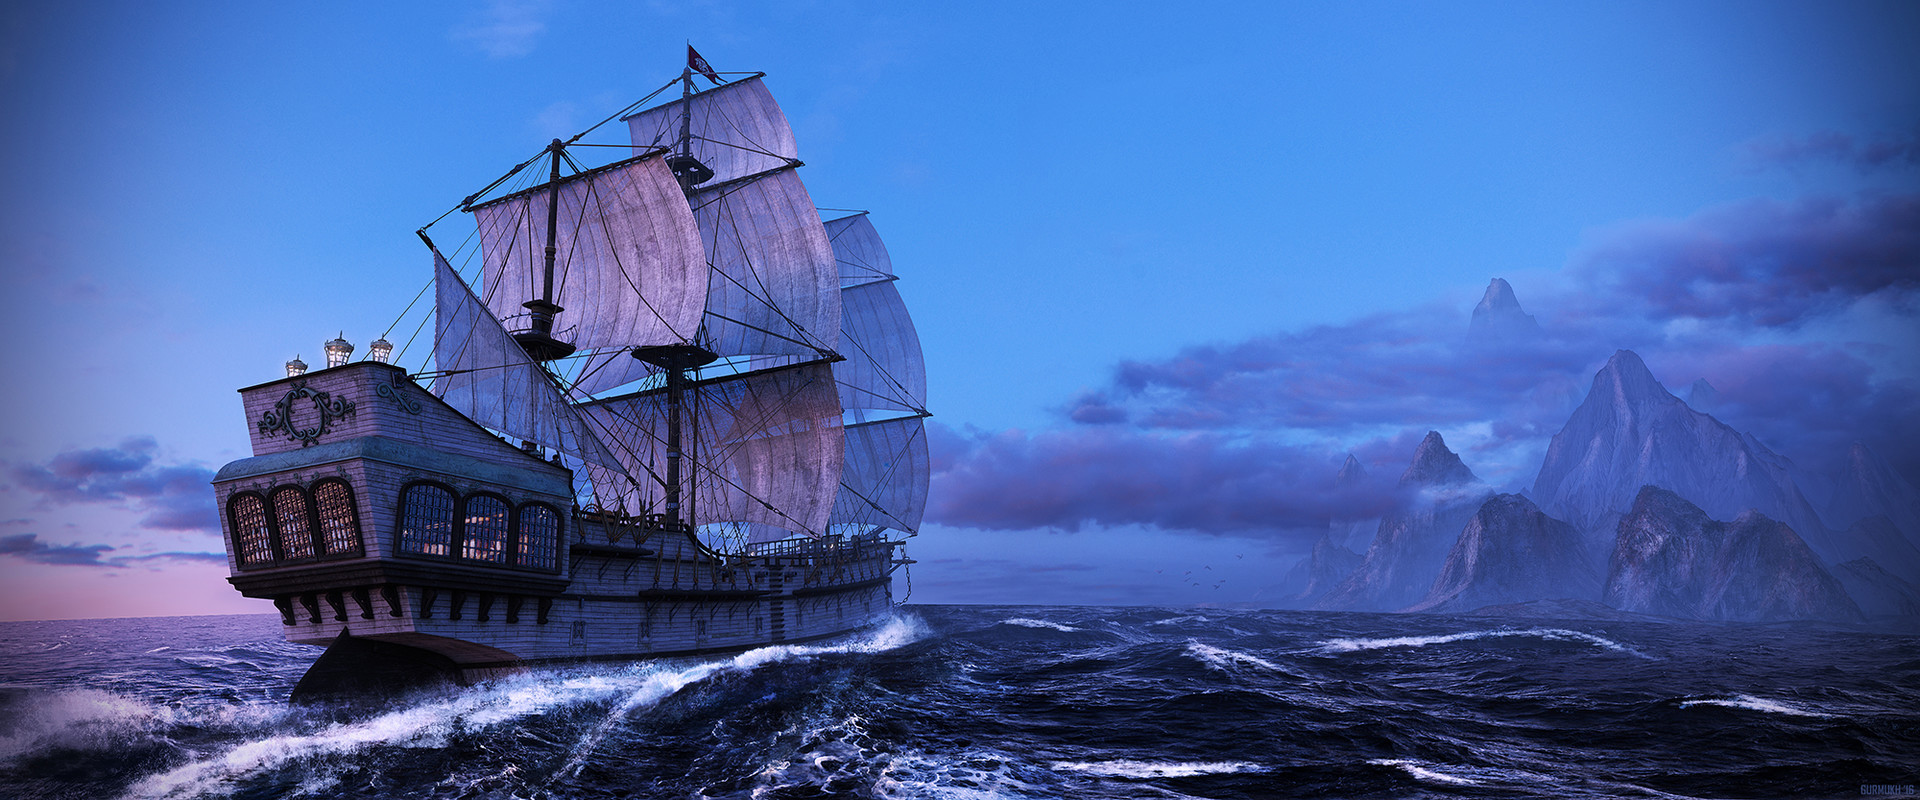 Gurmukh bhasin gurmukh pirate ship mountain final 2k